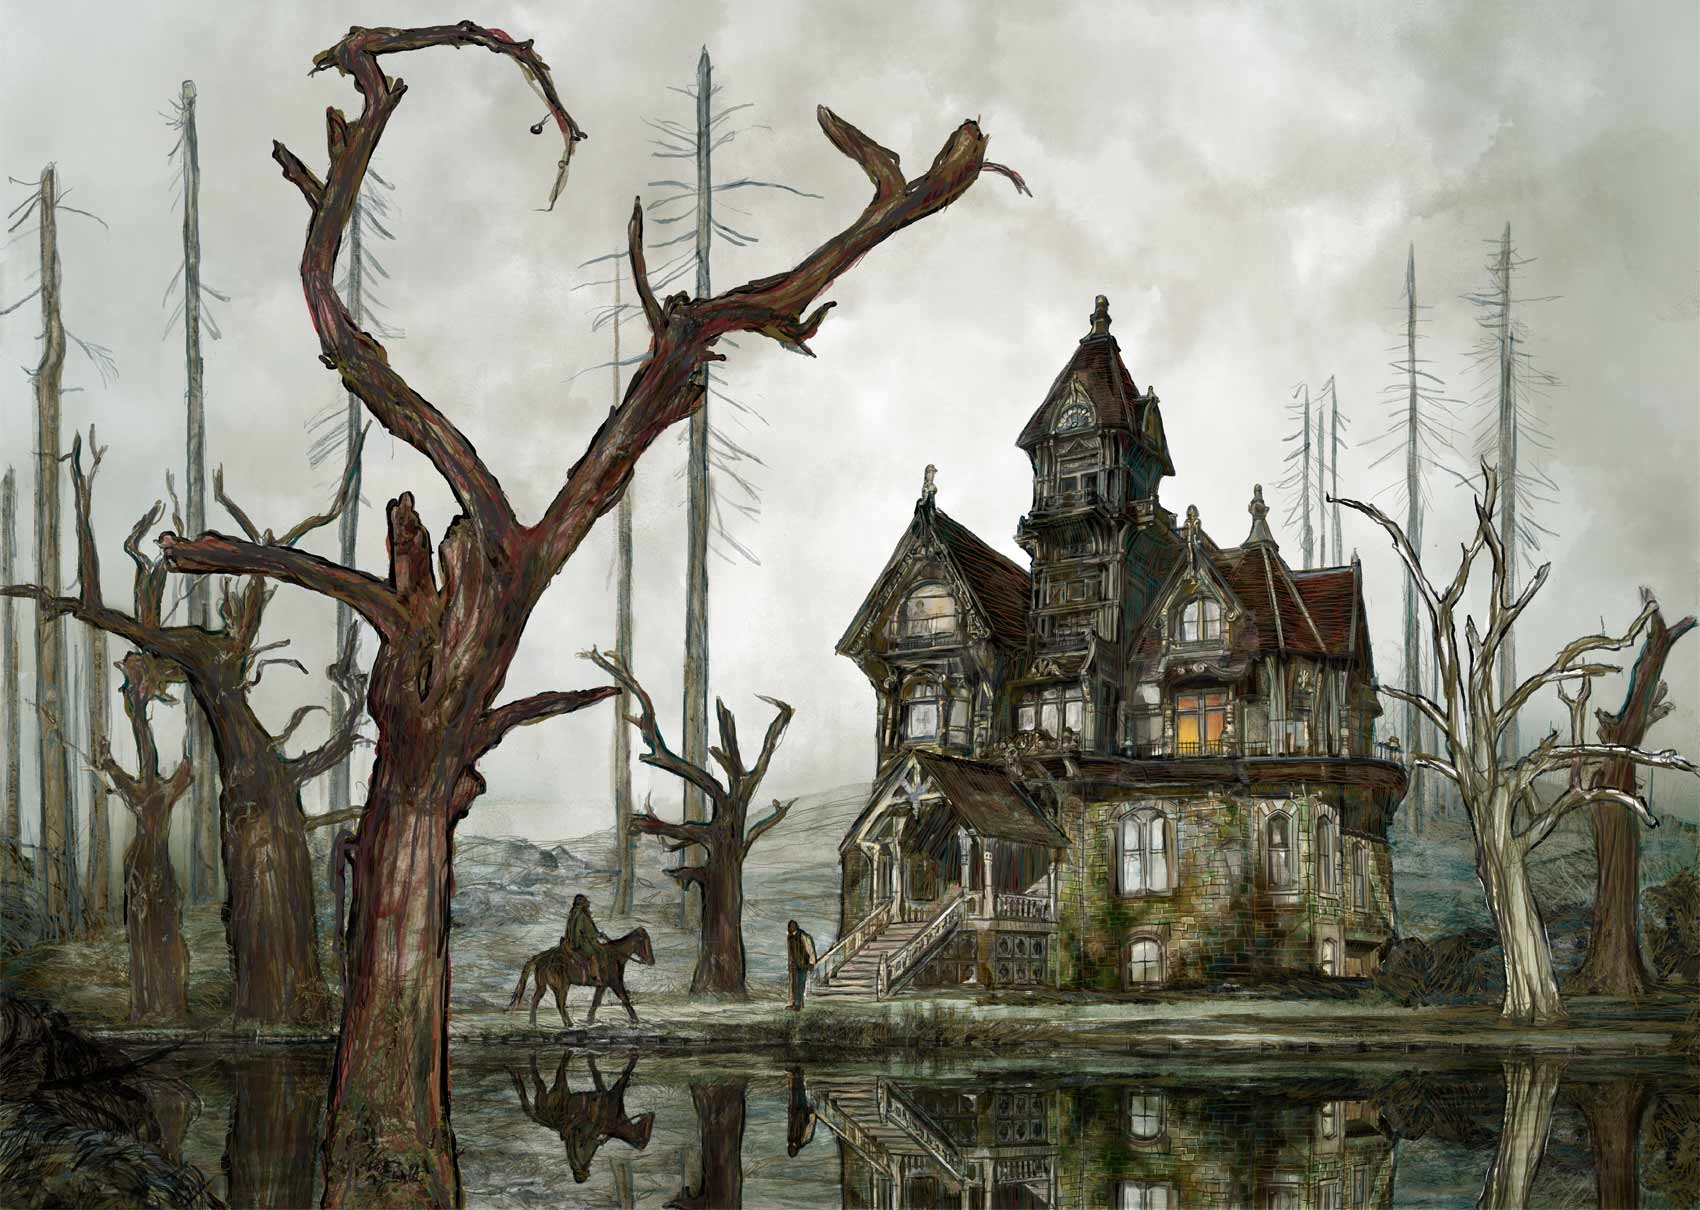 Mario Jodra illustration - The Fall of the House of Usher by Edgar Allan Poe.